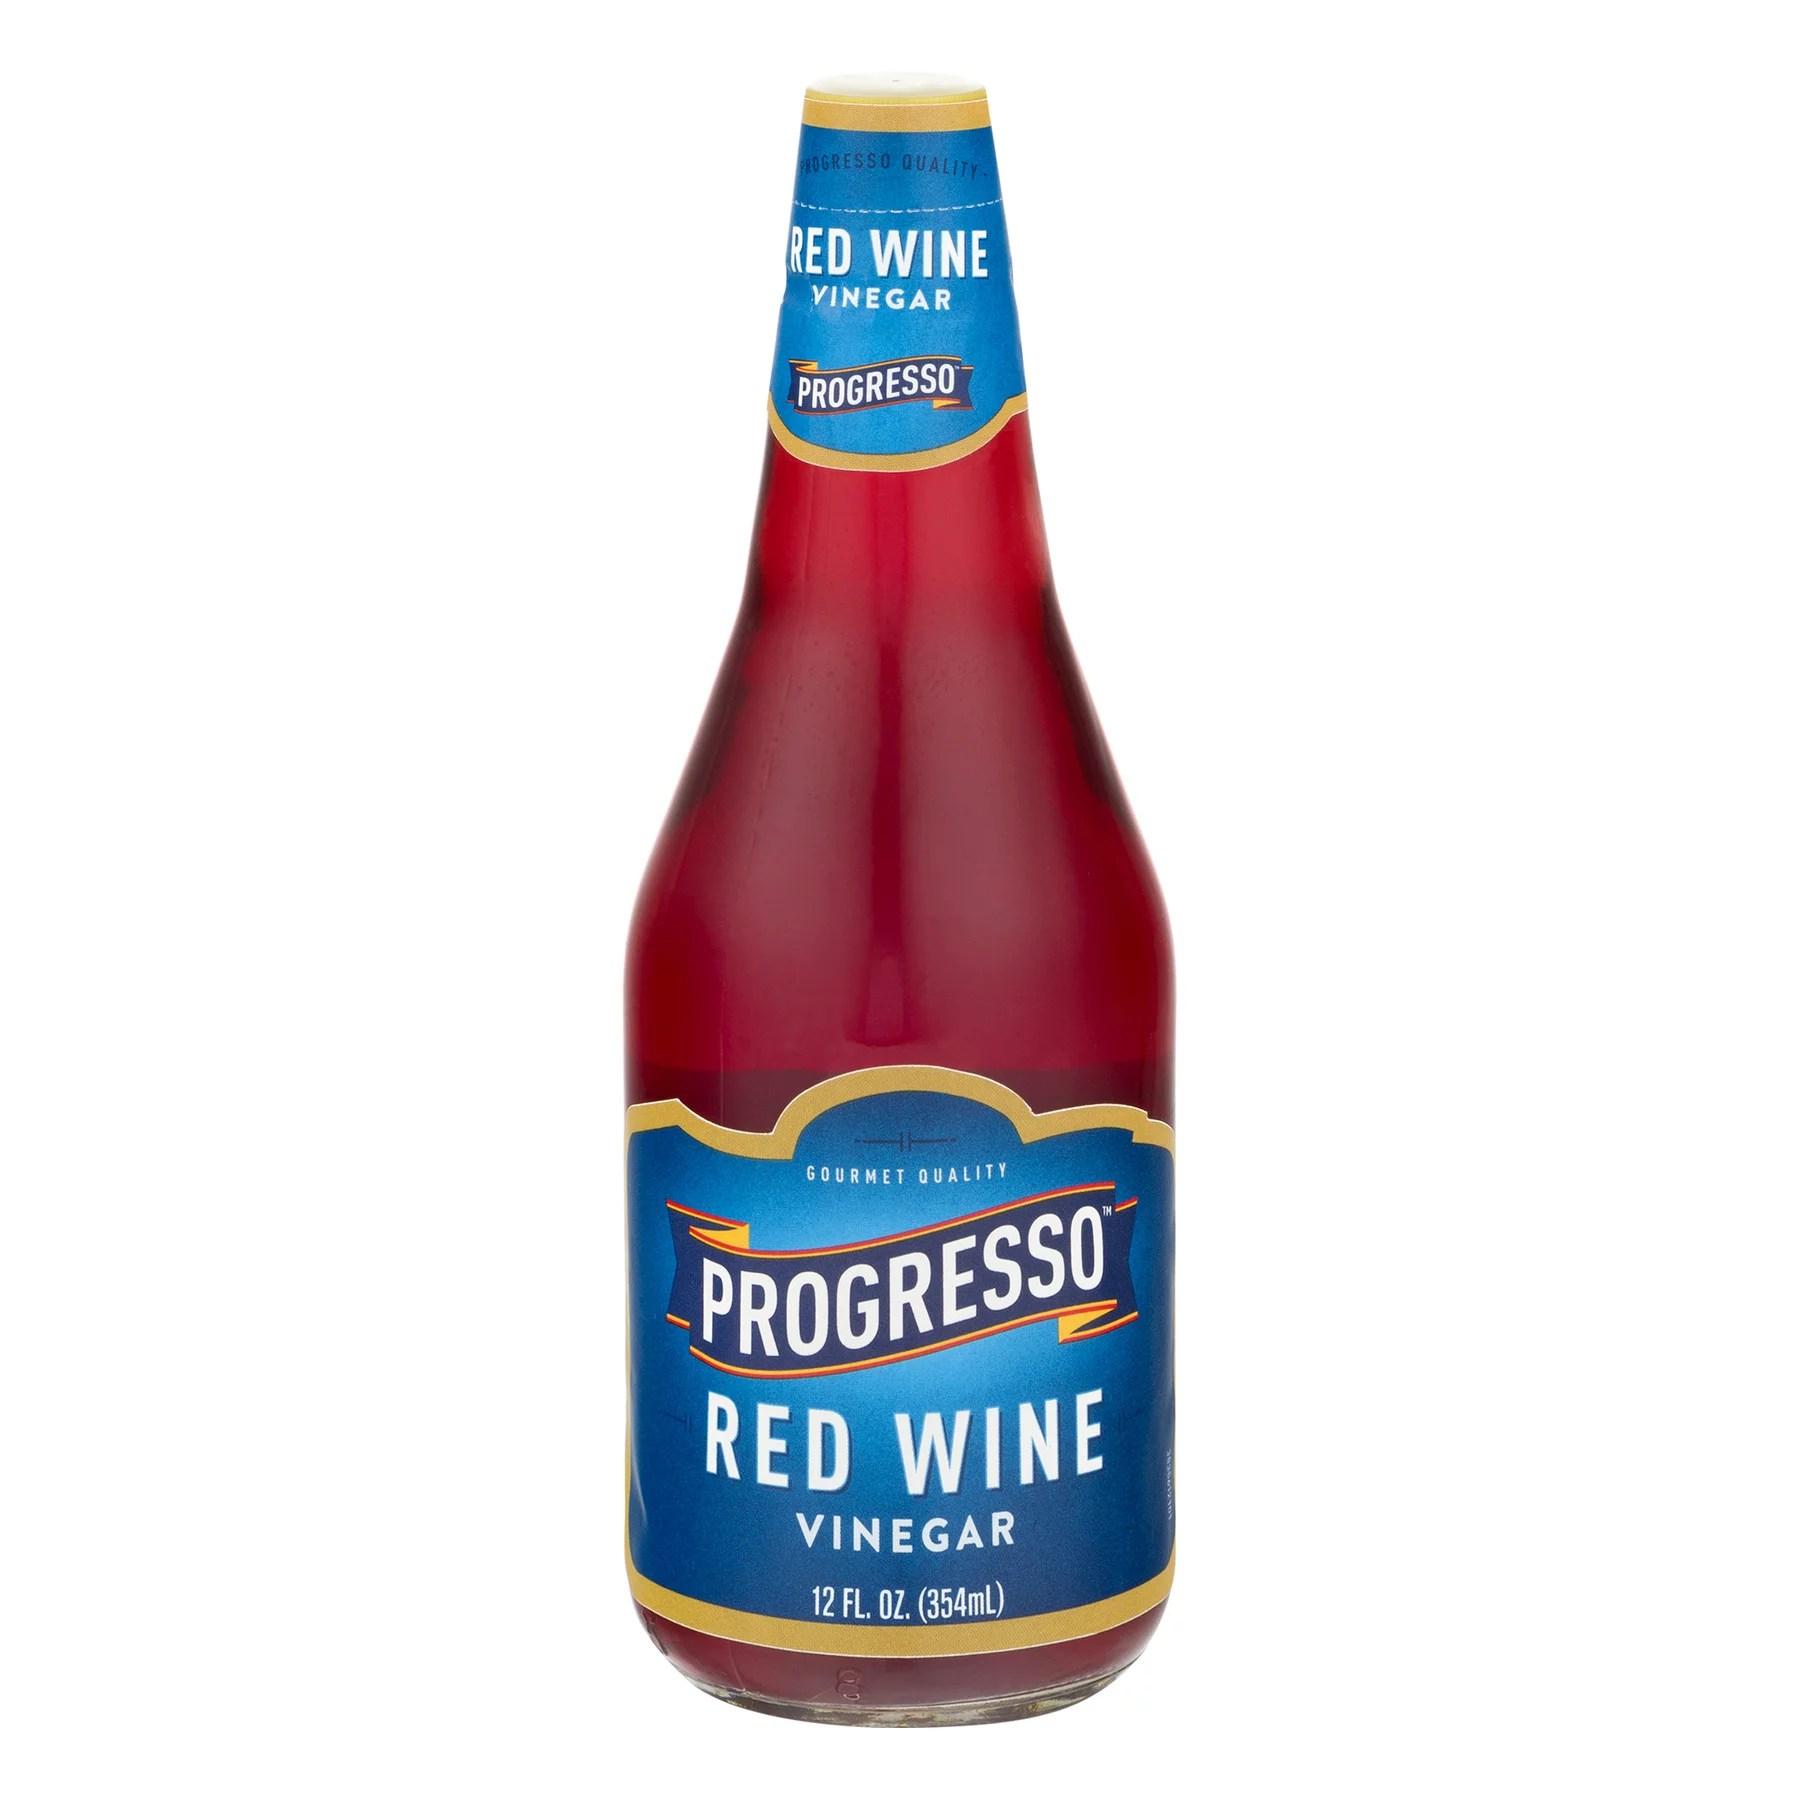 Progresso Vinegar Red Wine Decanter Vinegar 12 oz